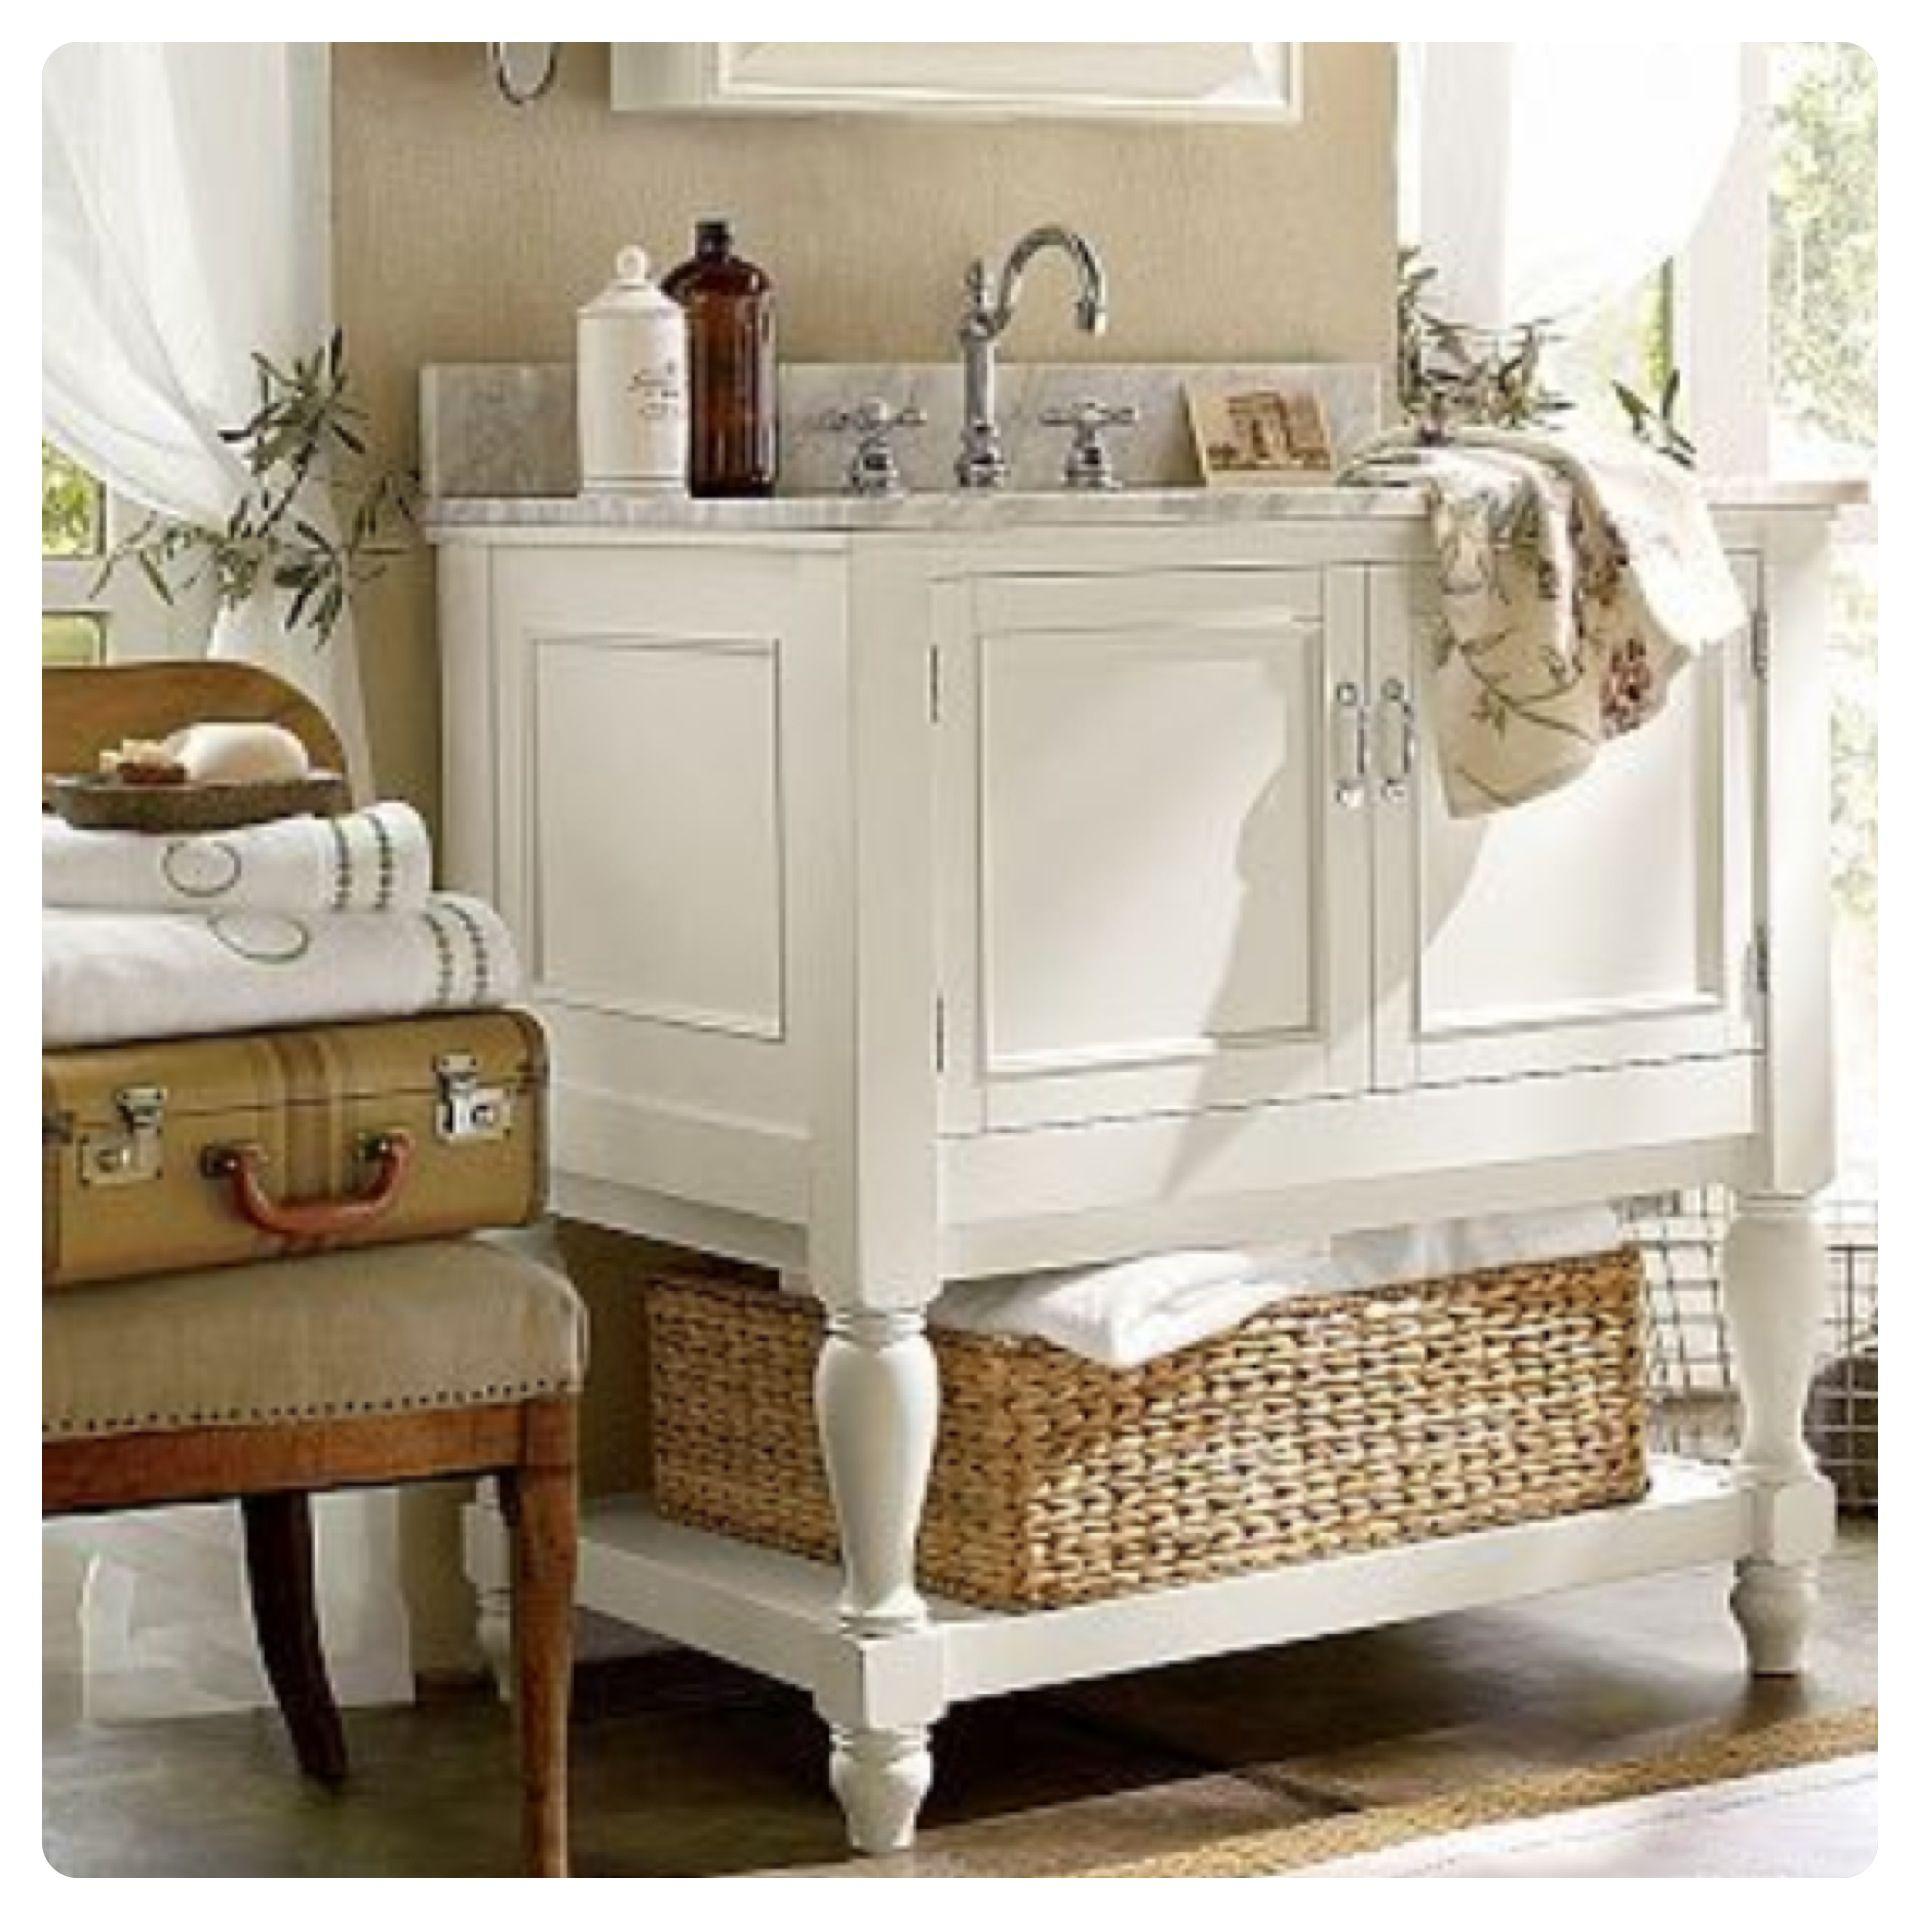 Vintage bathroom decor... Shabby chic bathroom. Country living ...